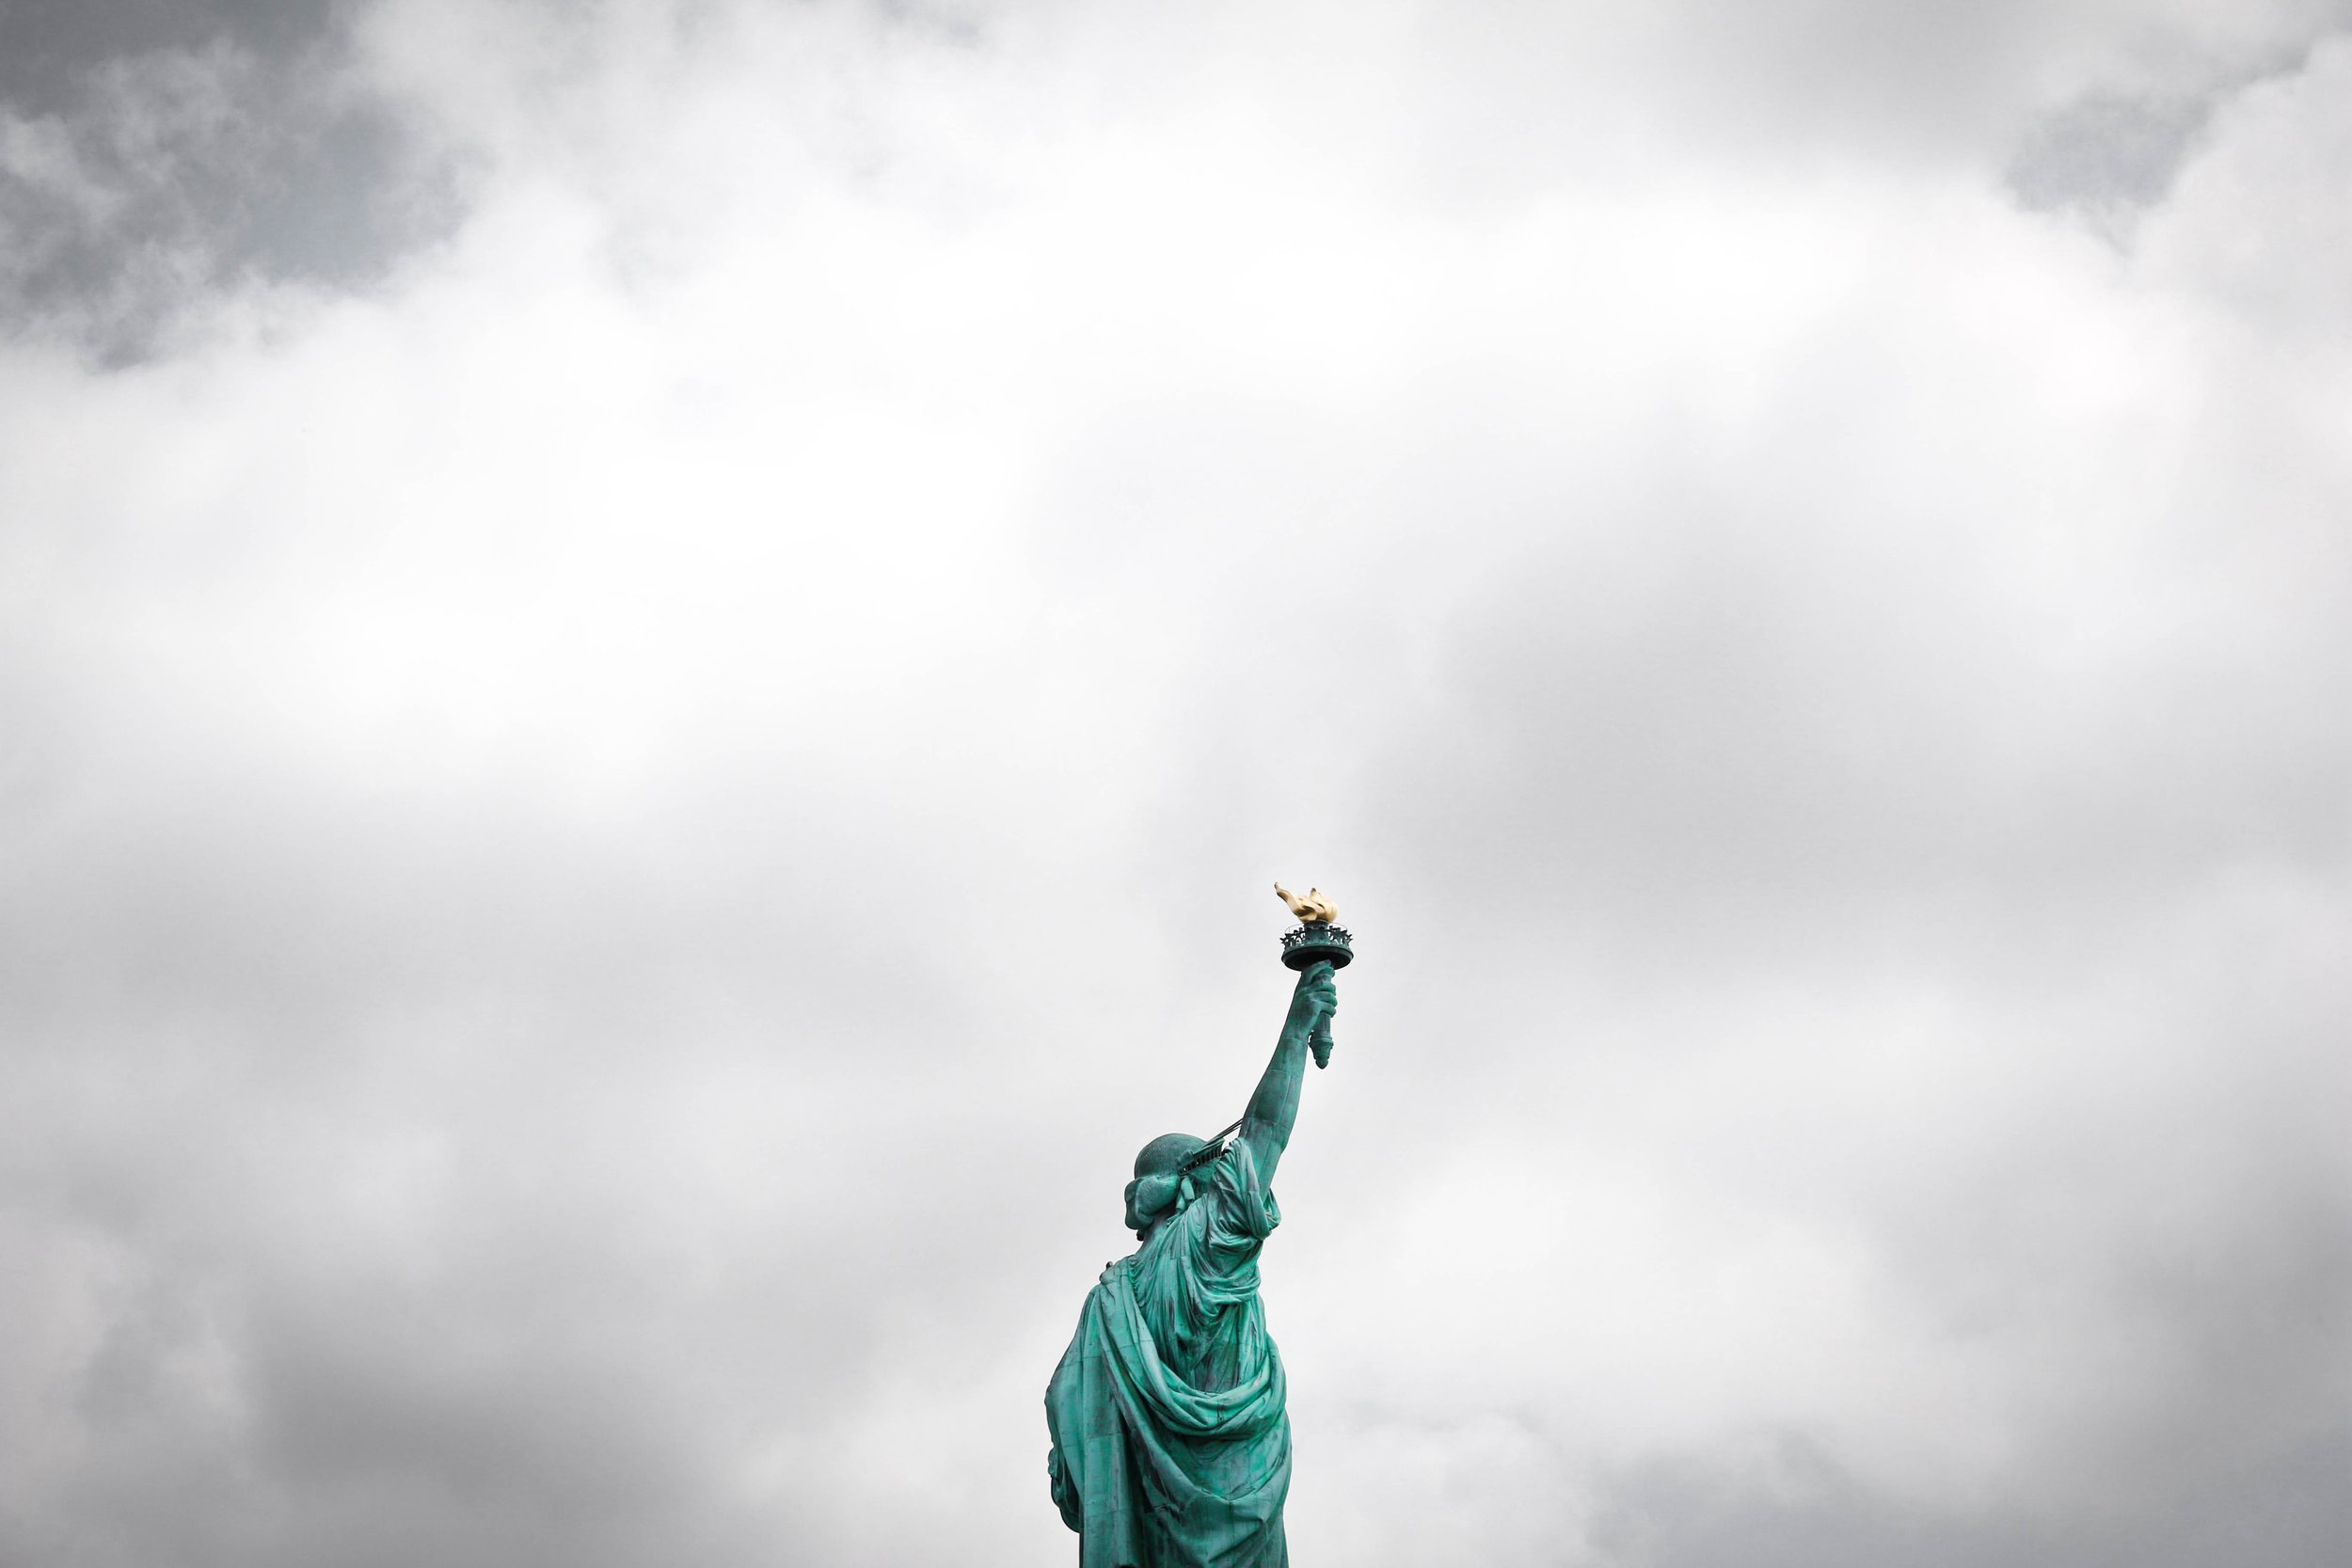 THE CODY GROUP NEW YORK - We make insurance easy.